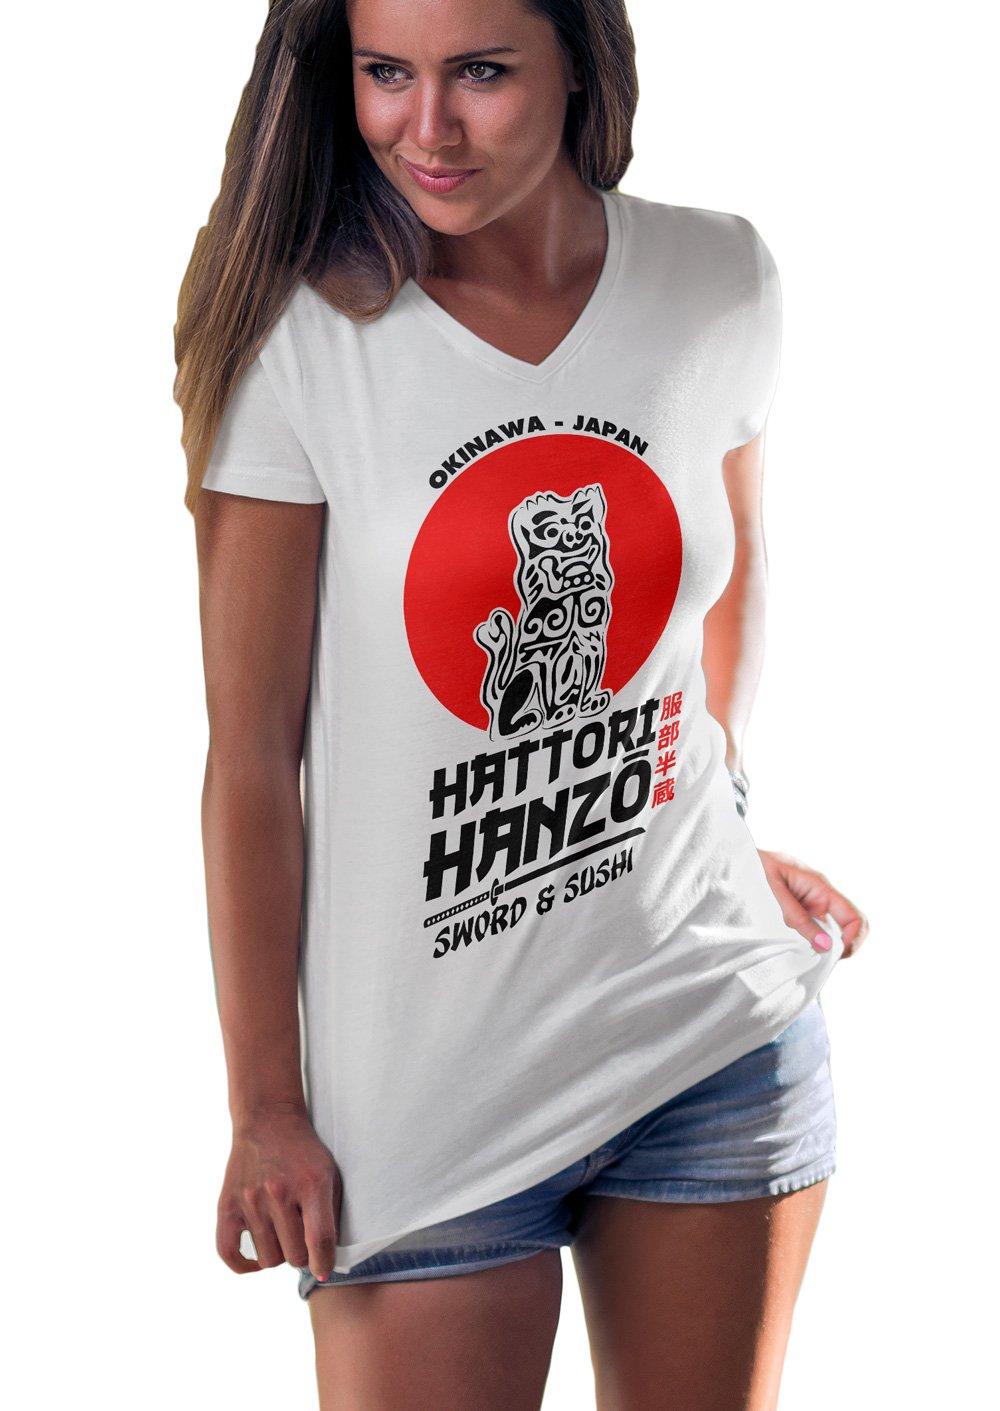 LeRage Shirts Hattori Hanzo Sword and Sushi Kill Bill Fan Made Shirt Women's